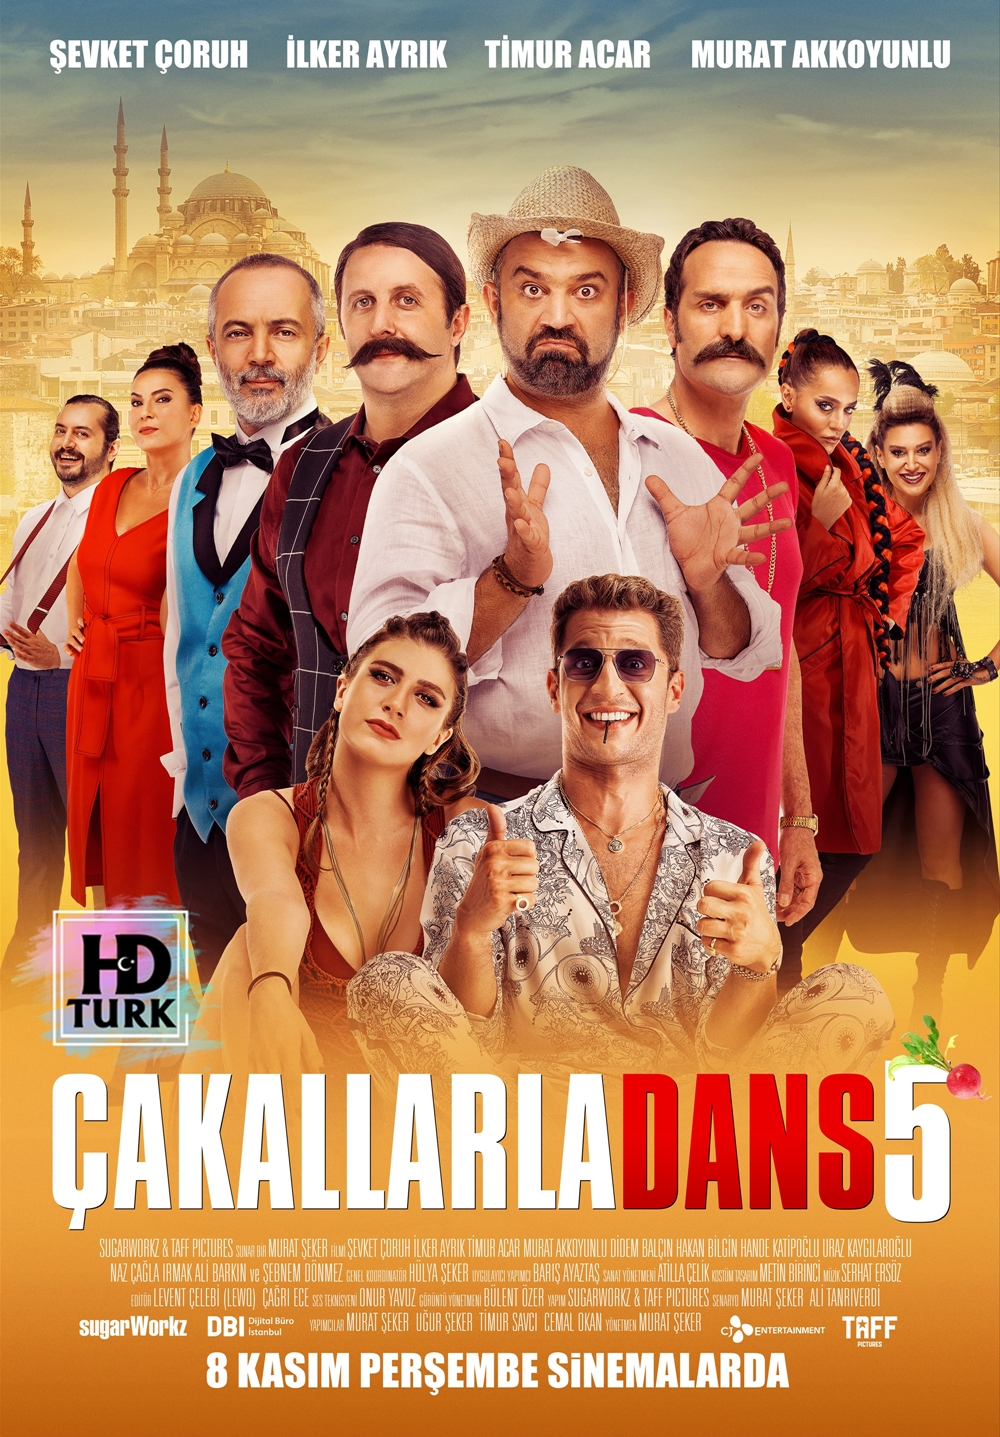 Çakallarla Dans 5 2018 Yerli Sansürsüz 1080p NF WEB-DL H264 AC3 5.1 - HdT.mkv